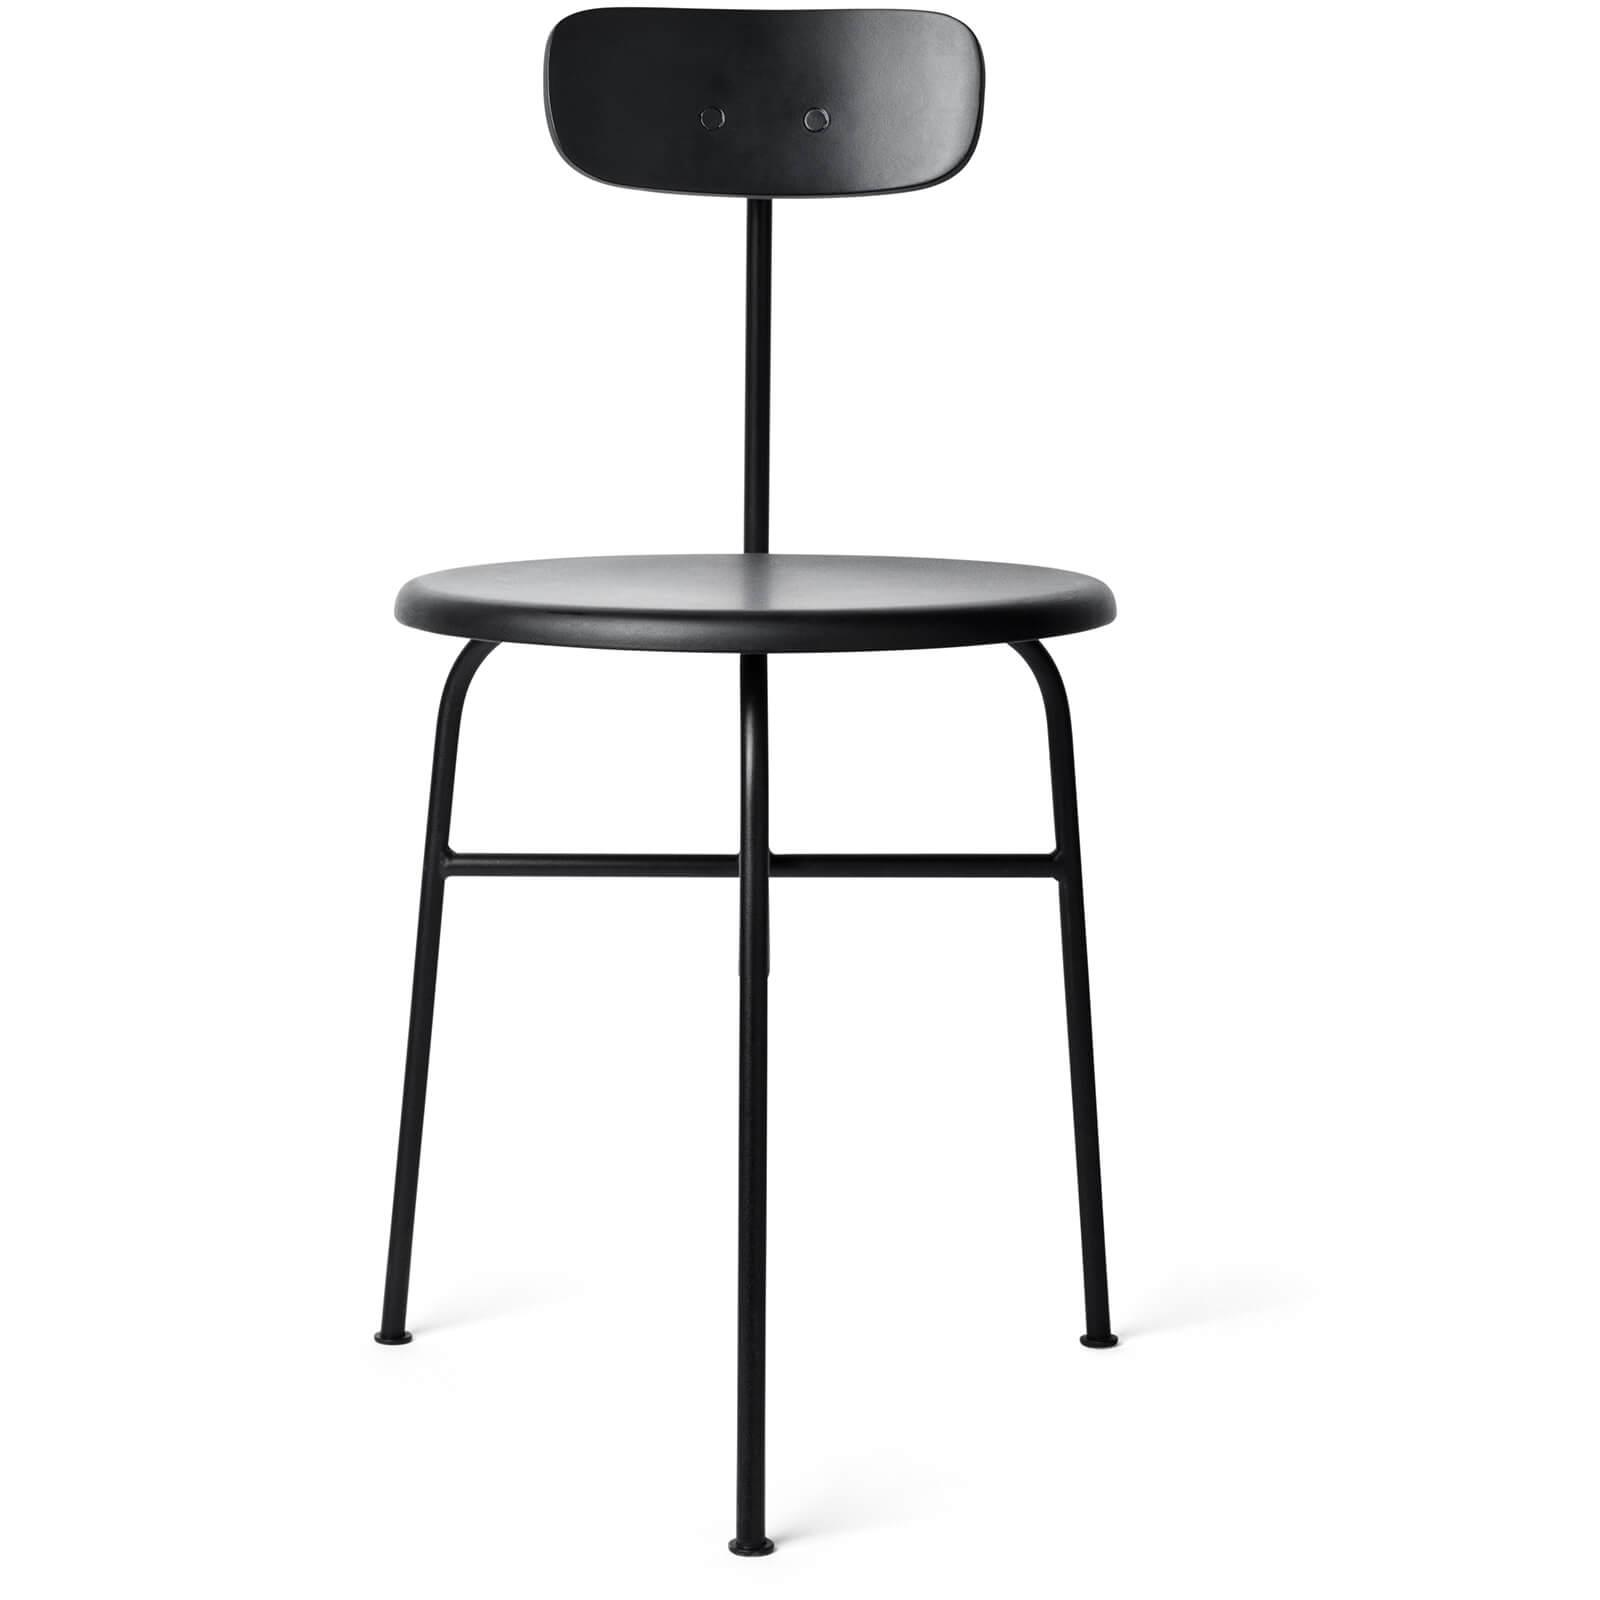 Menu Afteroom 3 Leg Dining Chair - Black